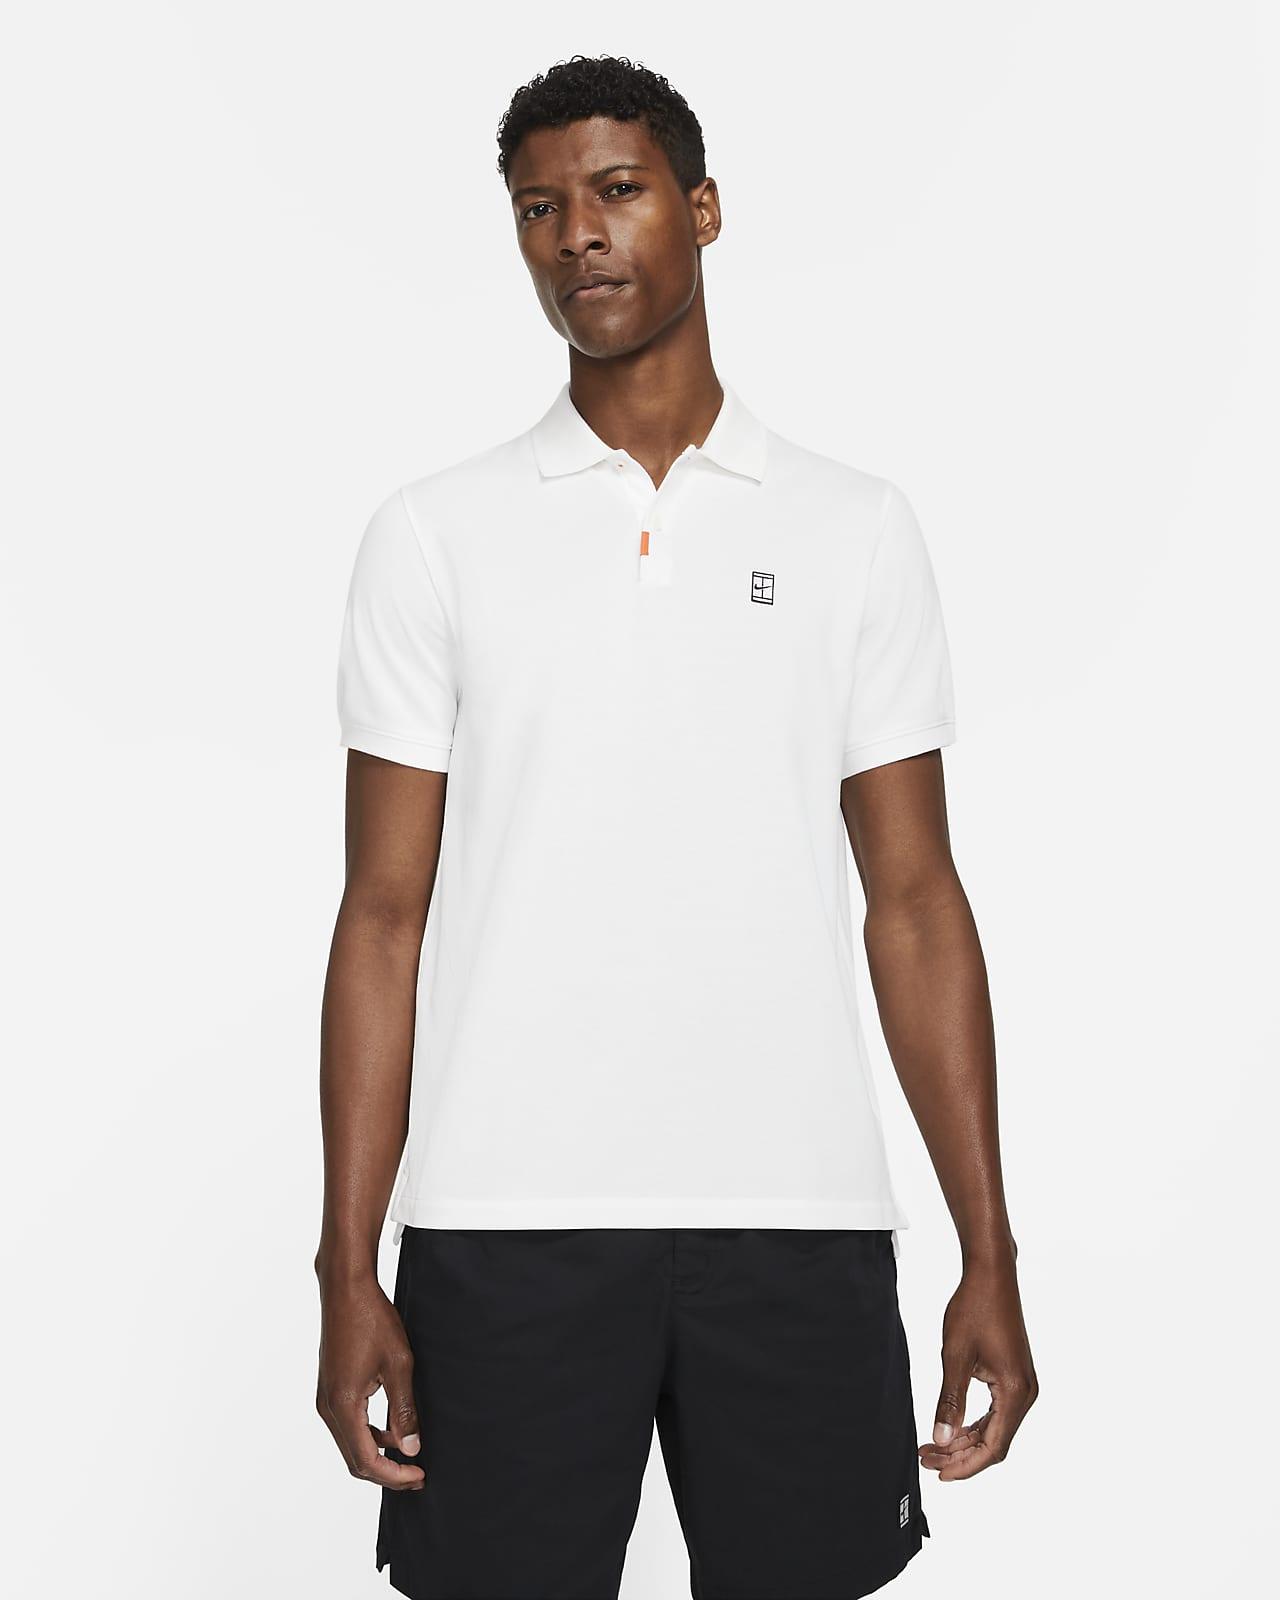 The Nike Polo Slam Men's Slim-Fit Polo